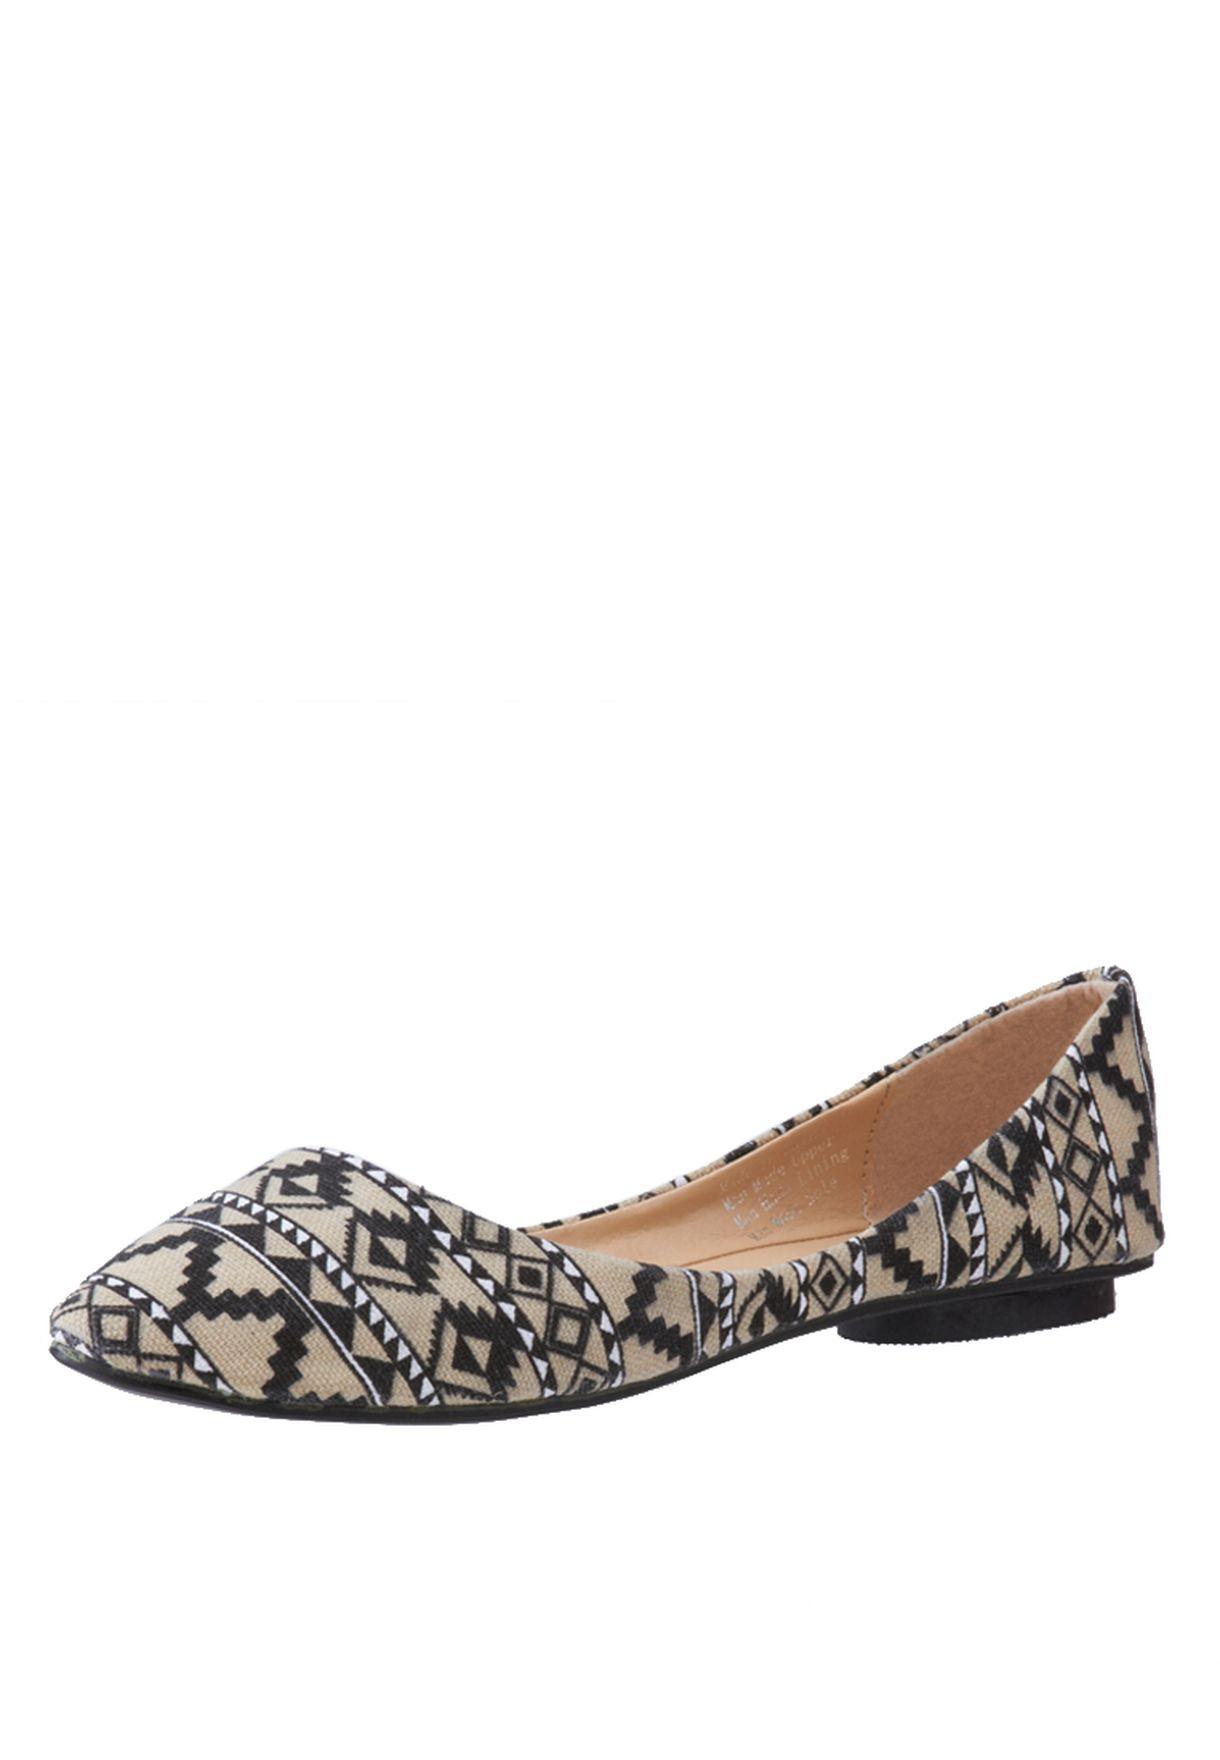 9c18a3597318 Genki Ballerina Shoes